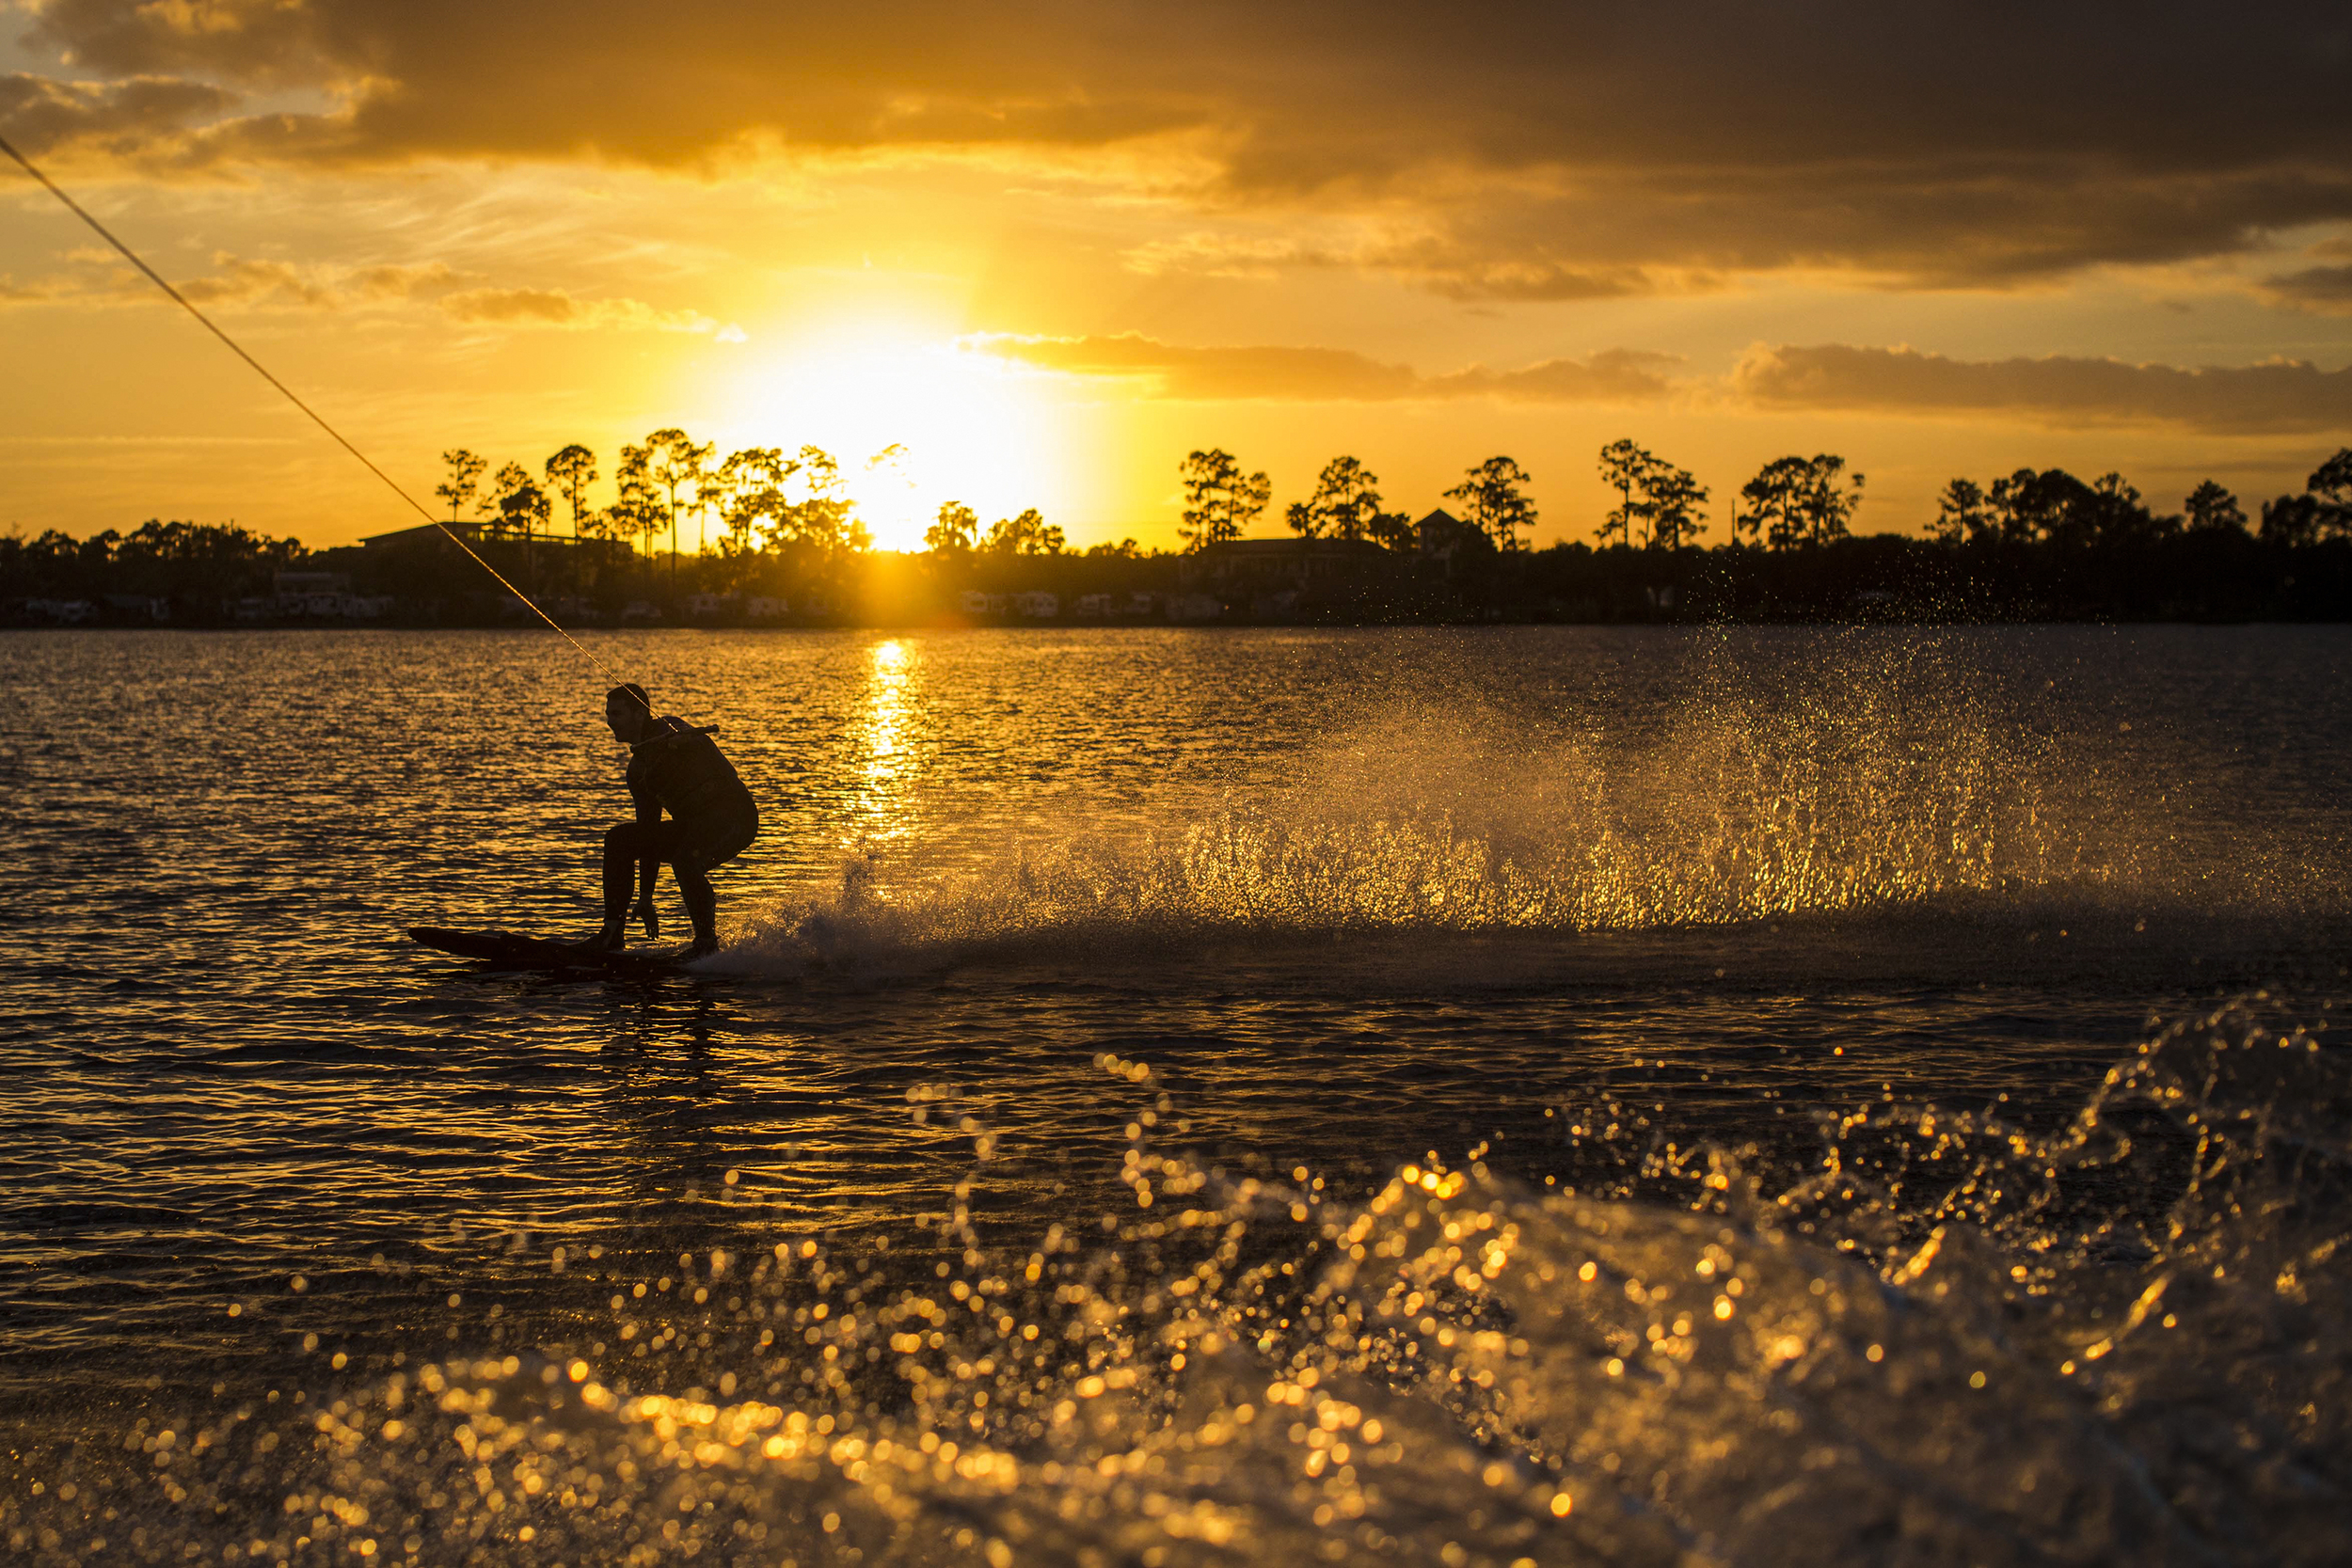 Dawson Botsford wake boards at Lake Whippoorwill in Orlando, Florida onChristmasDay 2013.